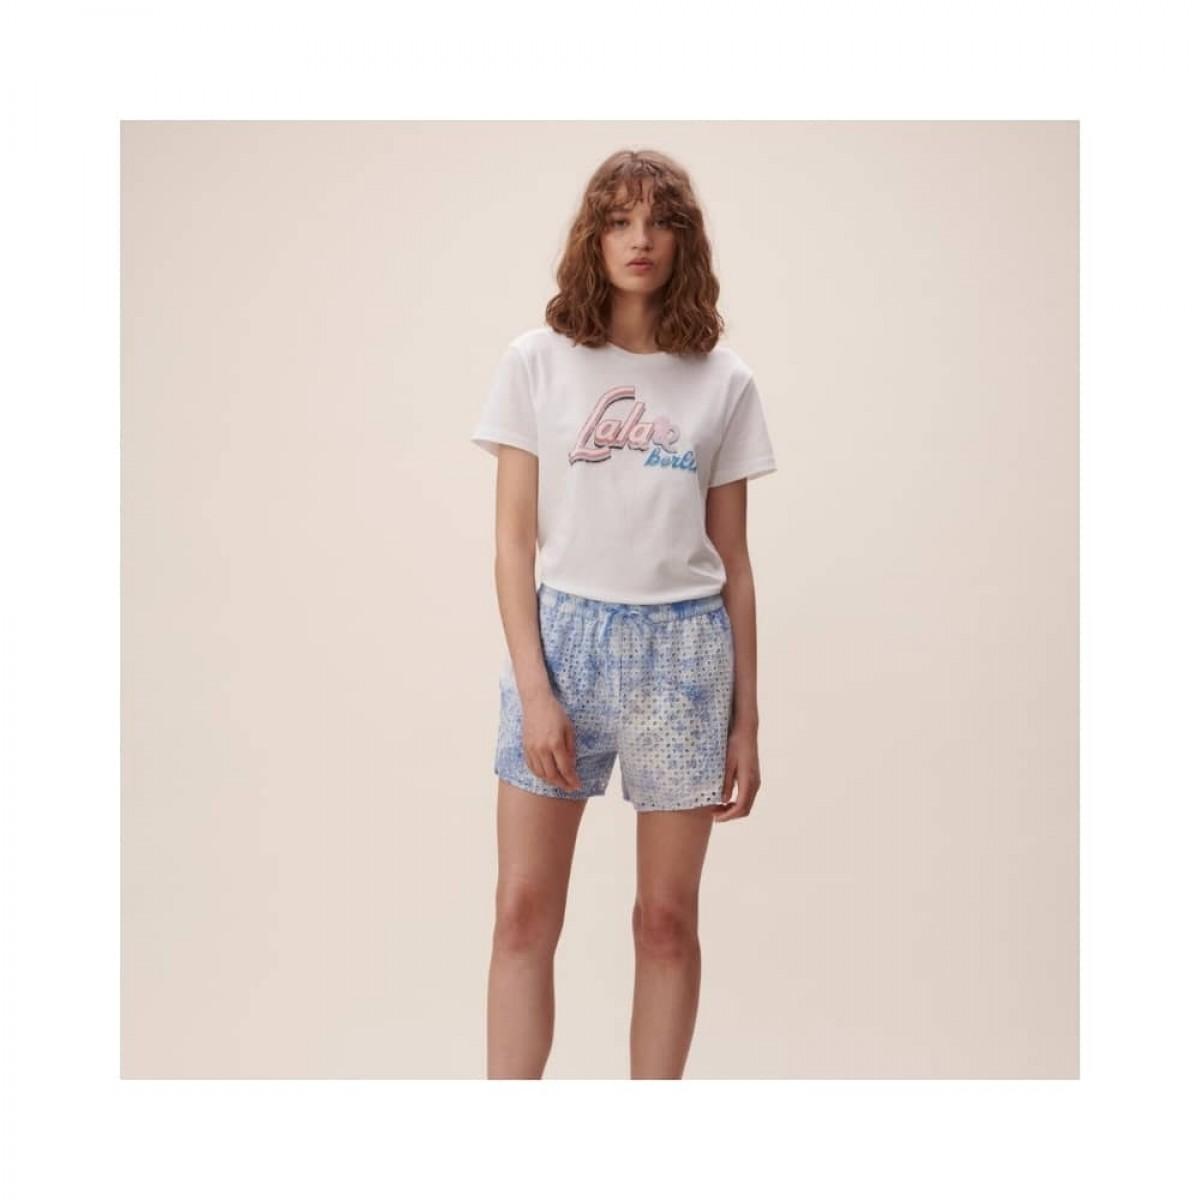 cara t-shirt - white - model front